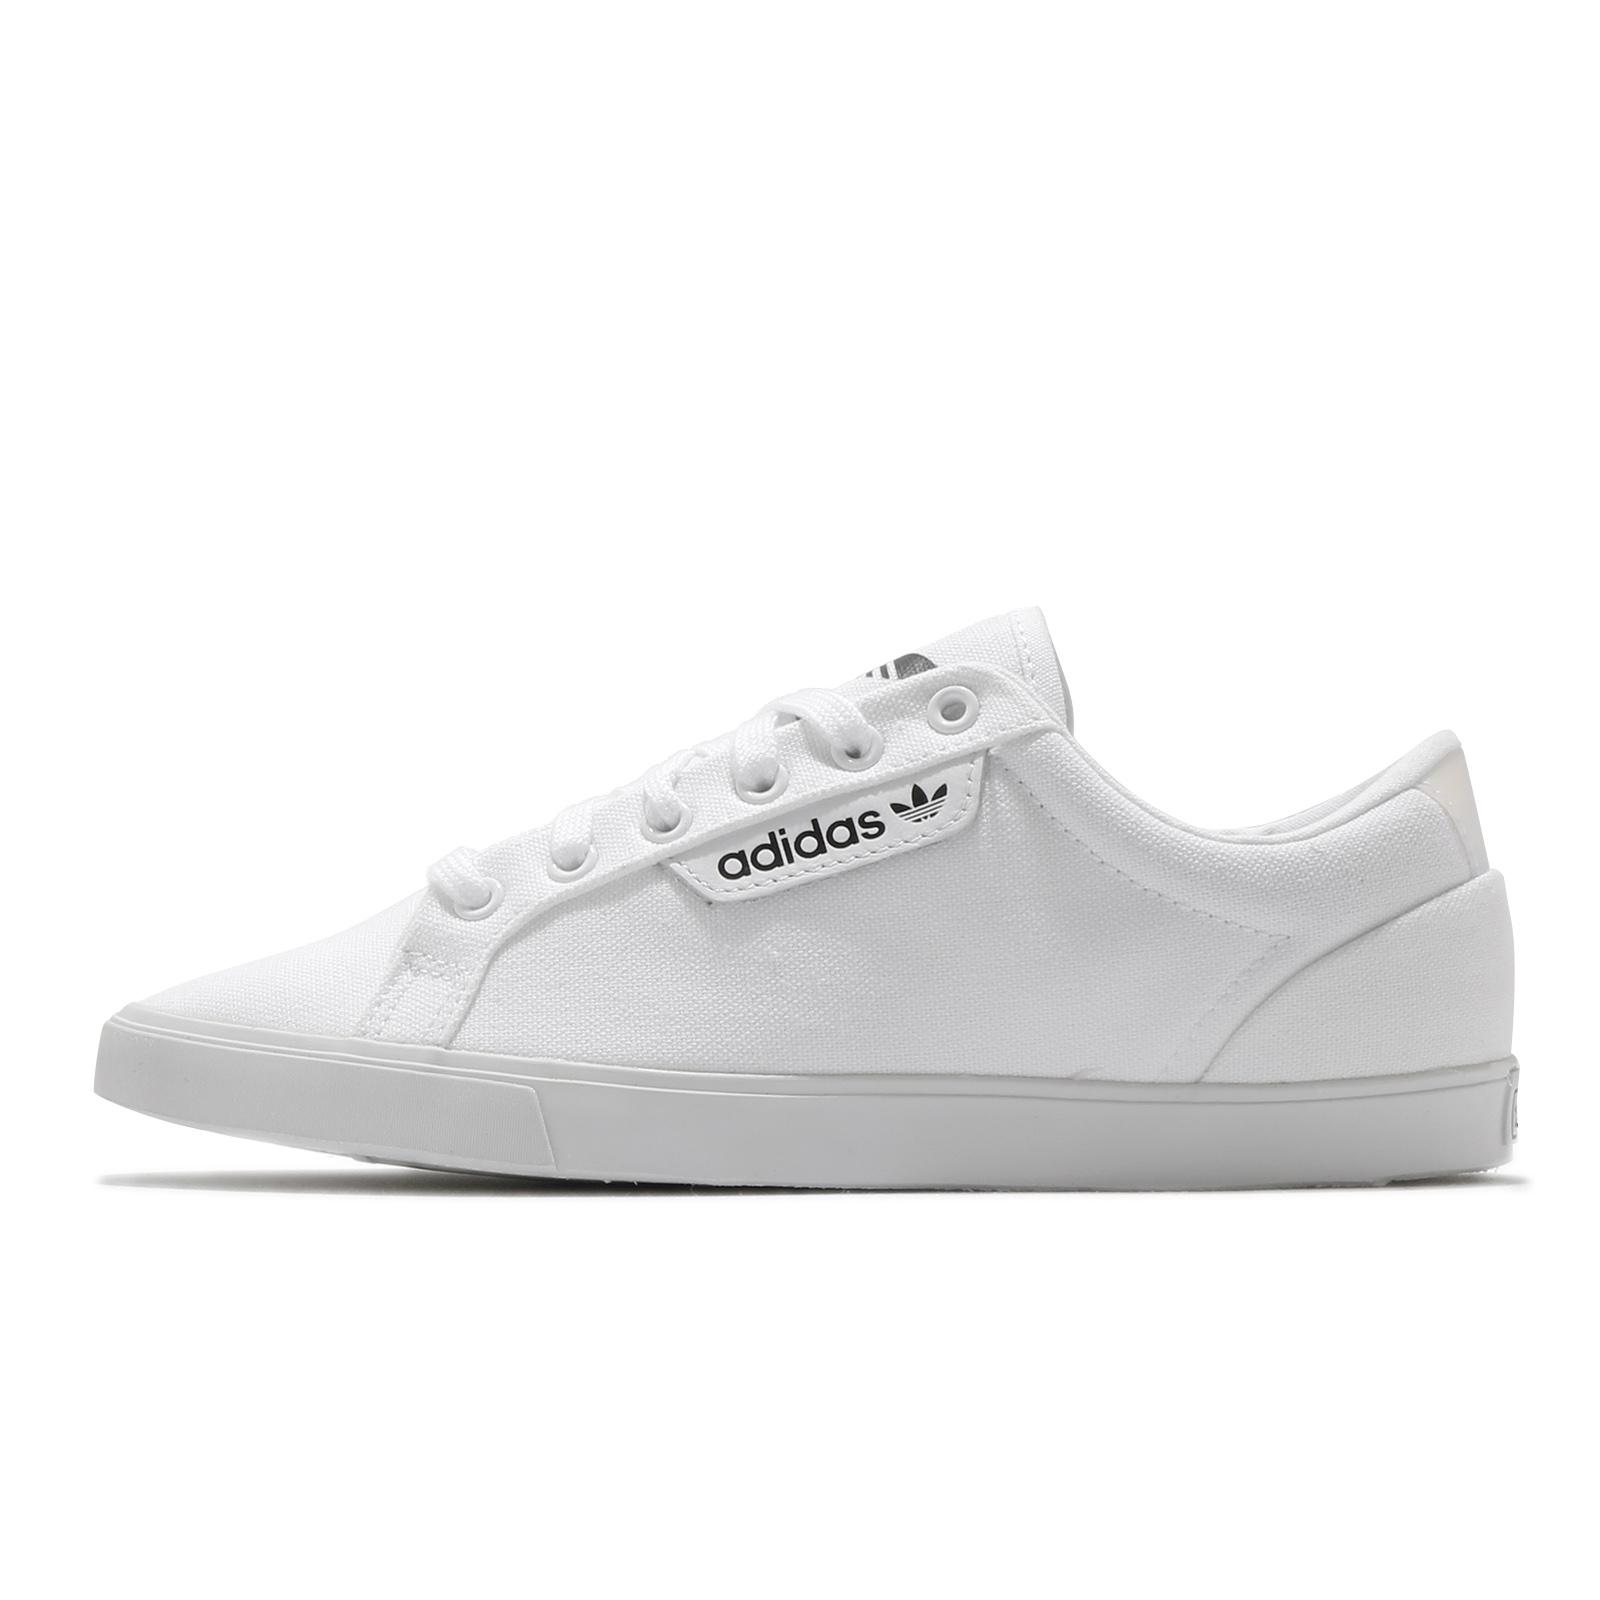 adidas 休閒鞋 Sleek Lo 白 黑 女鞋 帆布 小白鞋 三葉草 愛迪達 【ACS】 FV0742